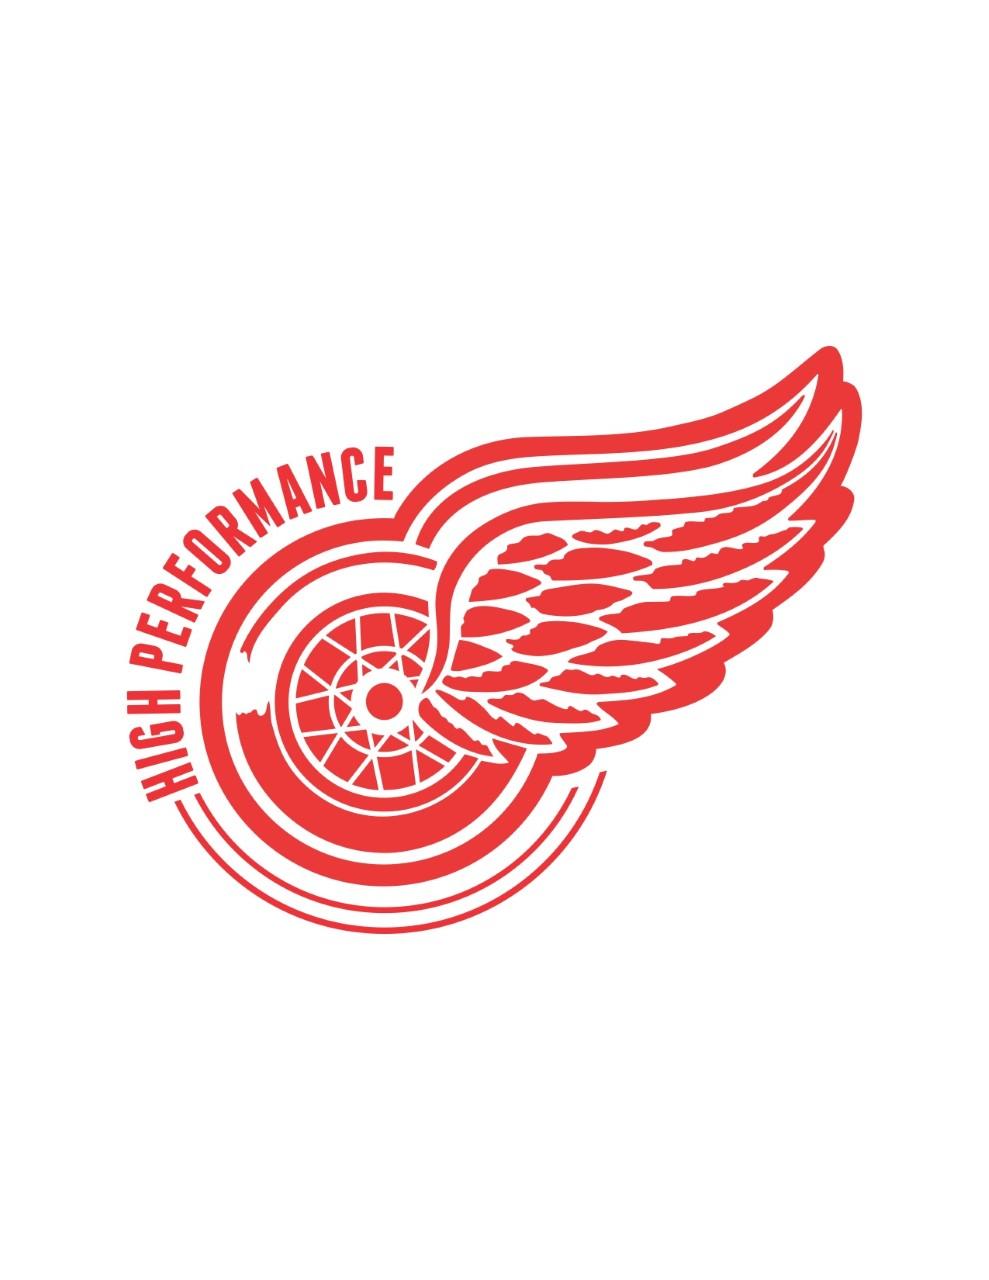 2007 High Performance Redwings